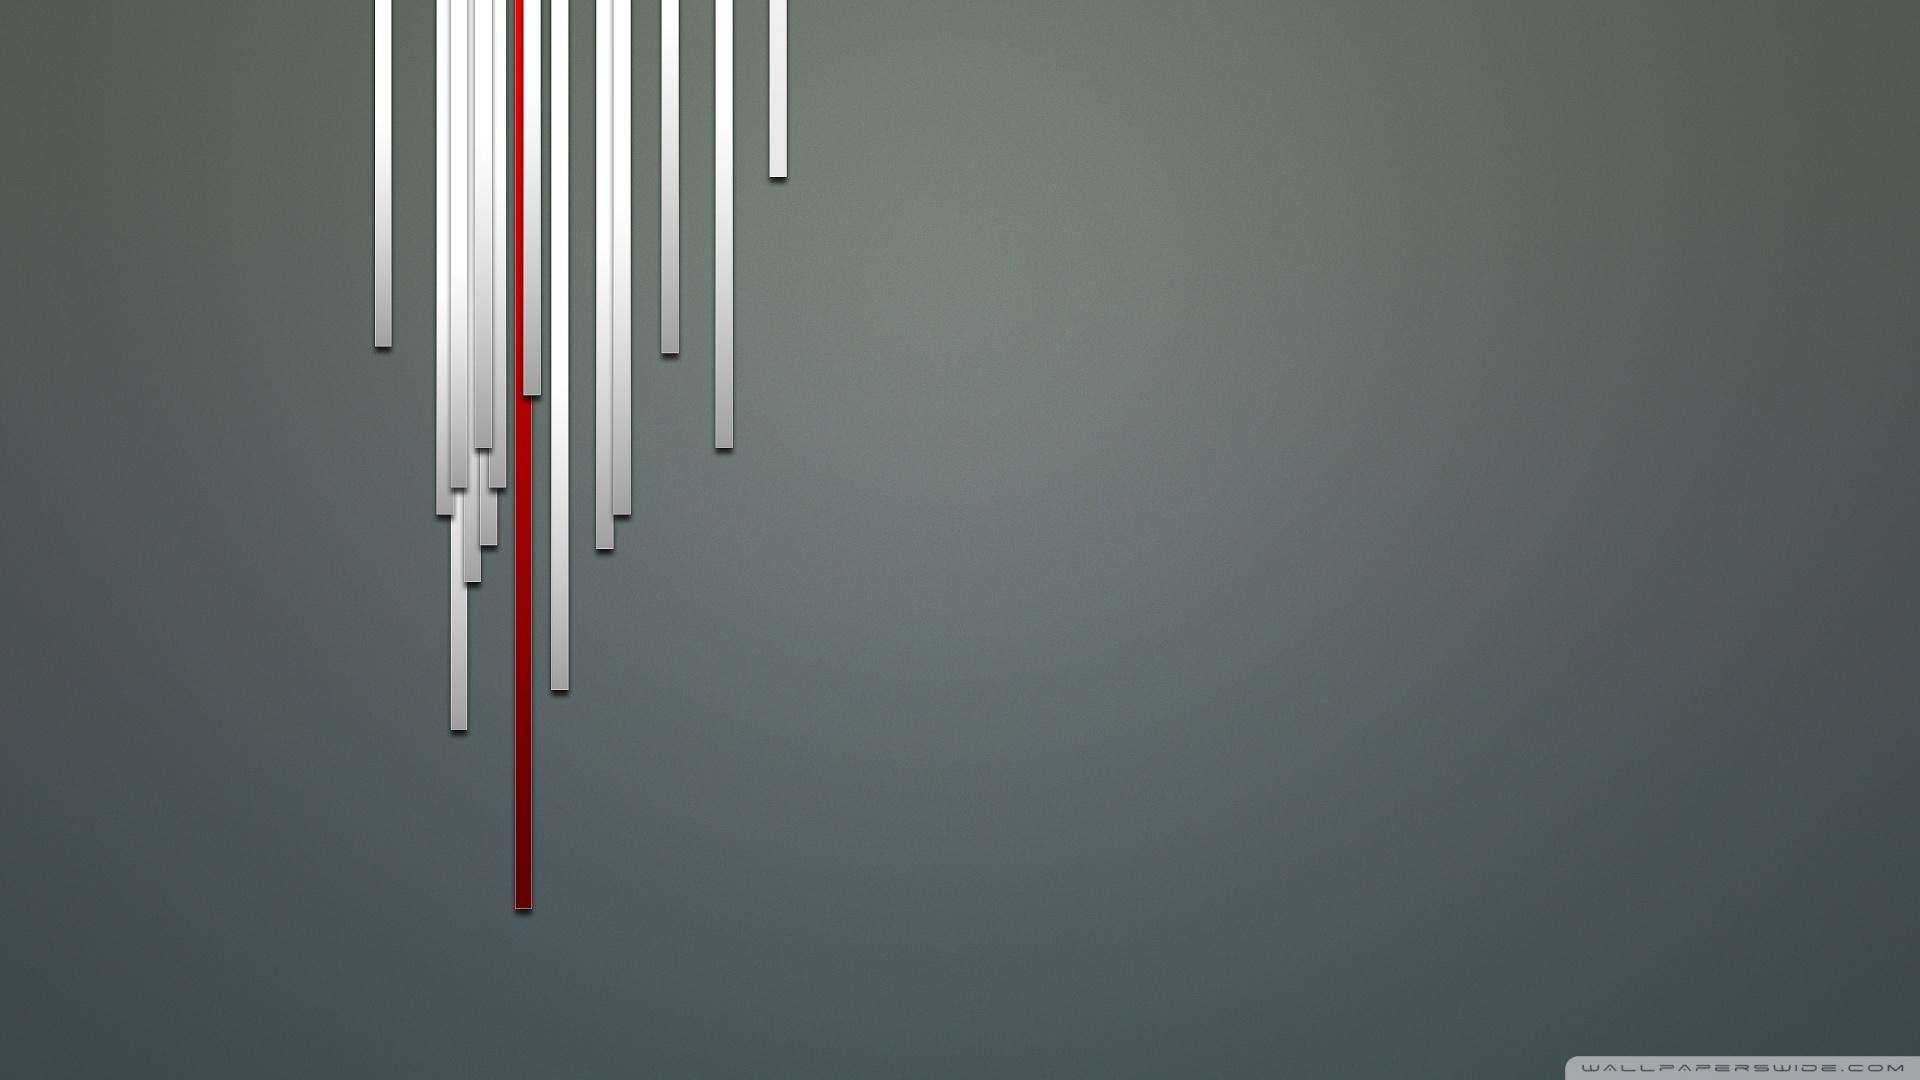 Red Line HD desktop wallpaper : High Definition : Fullscreen : Mobile